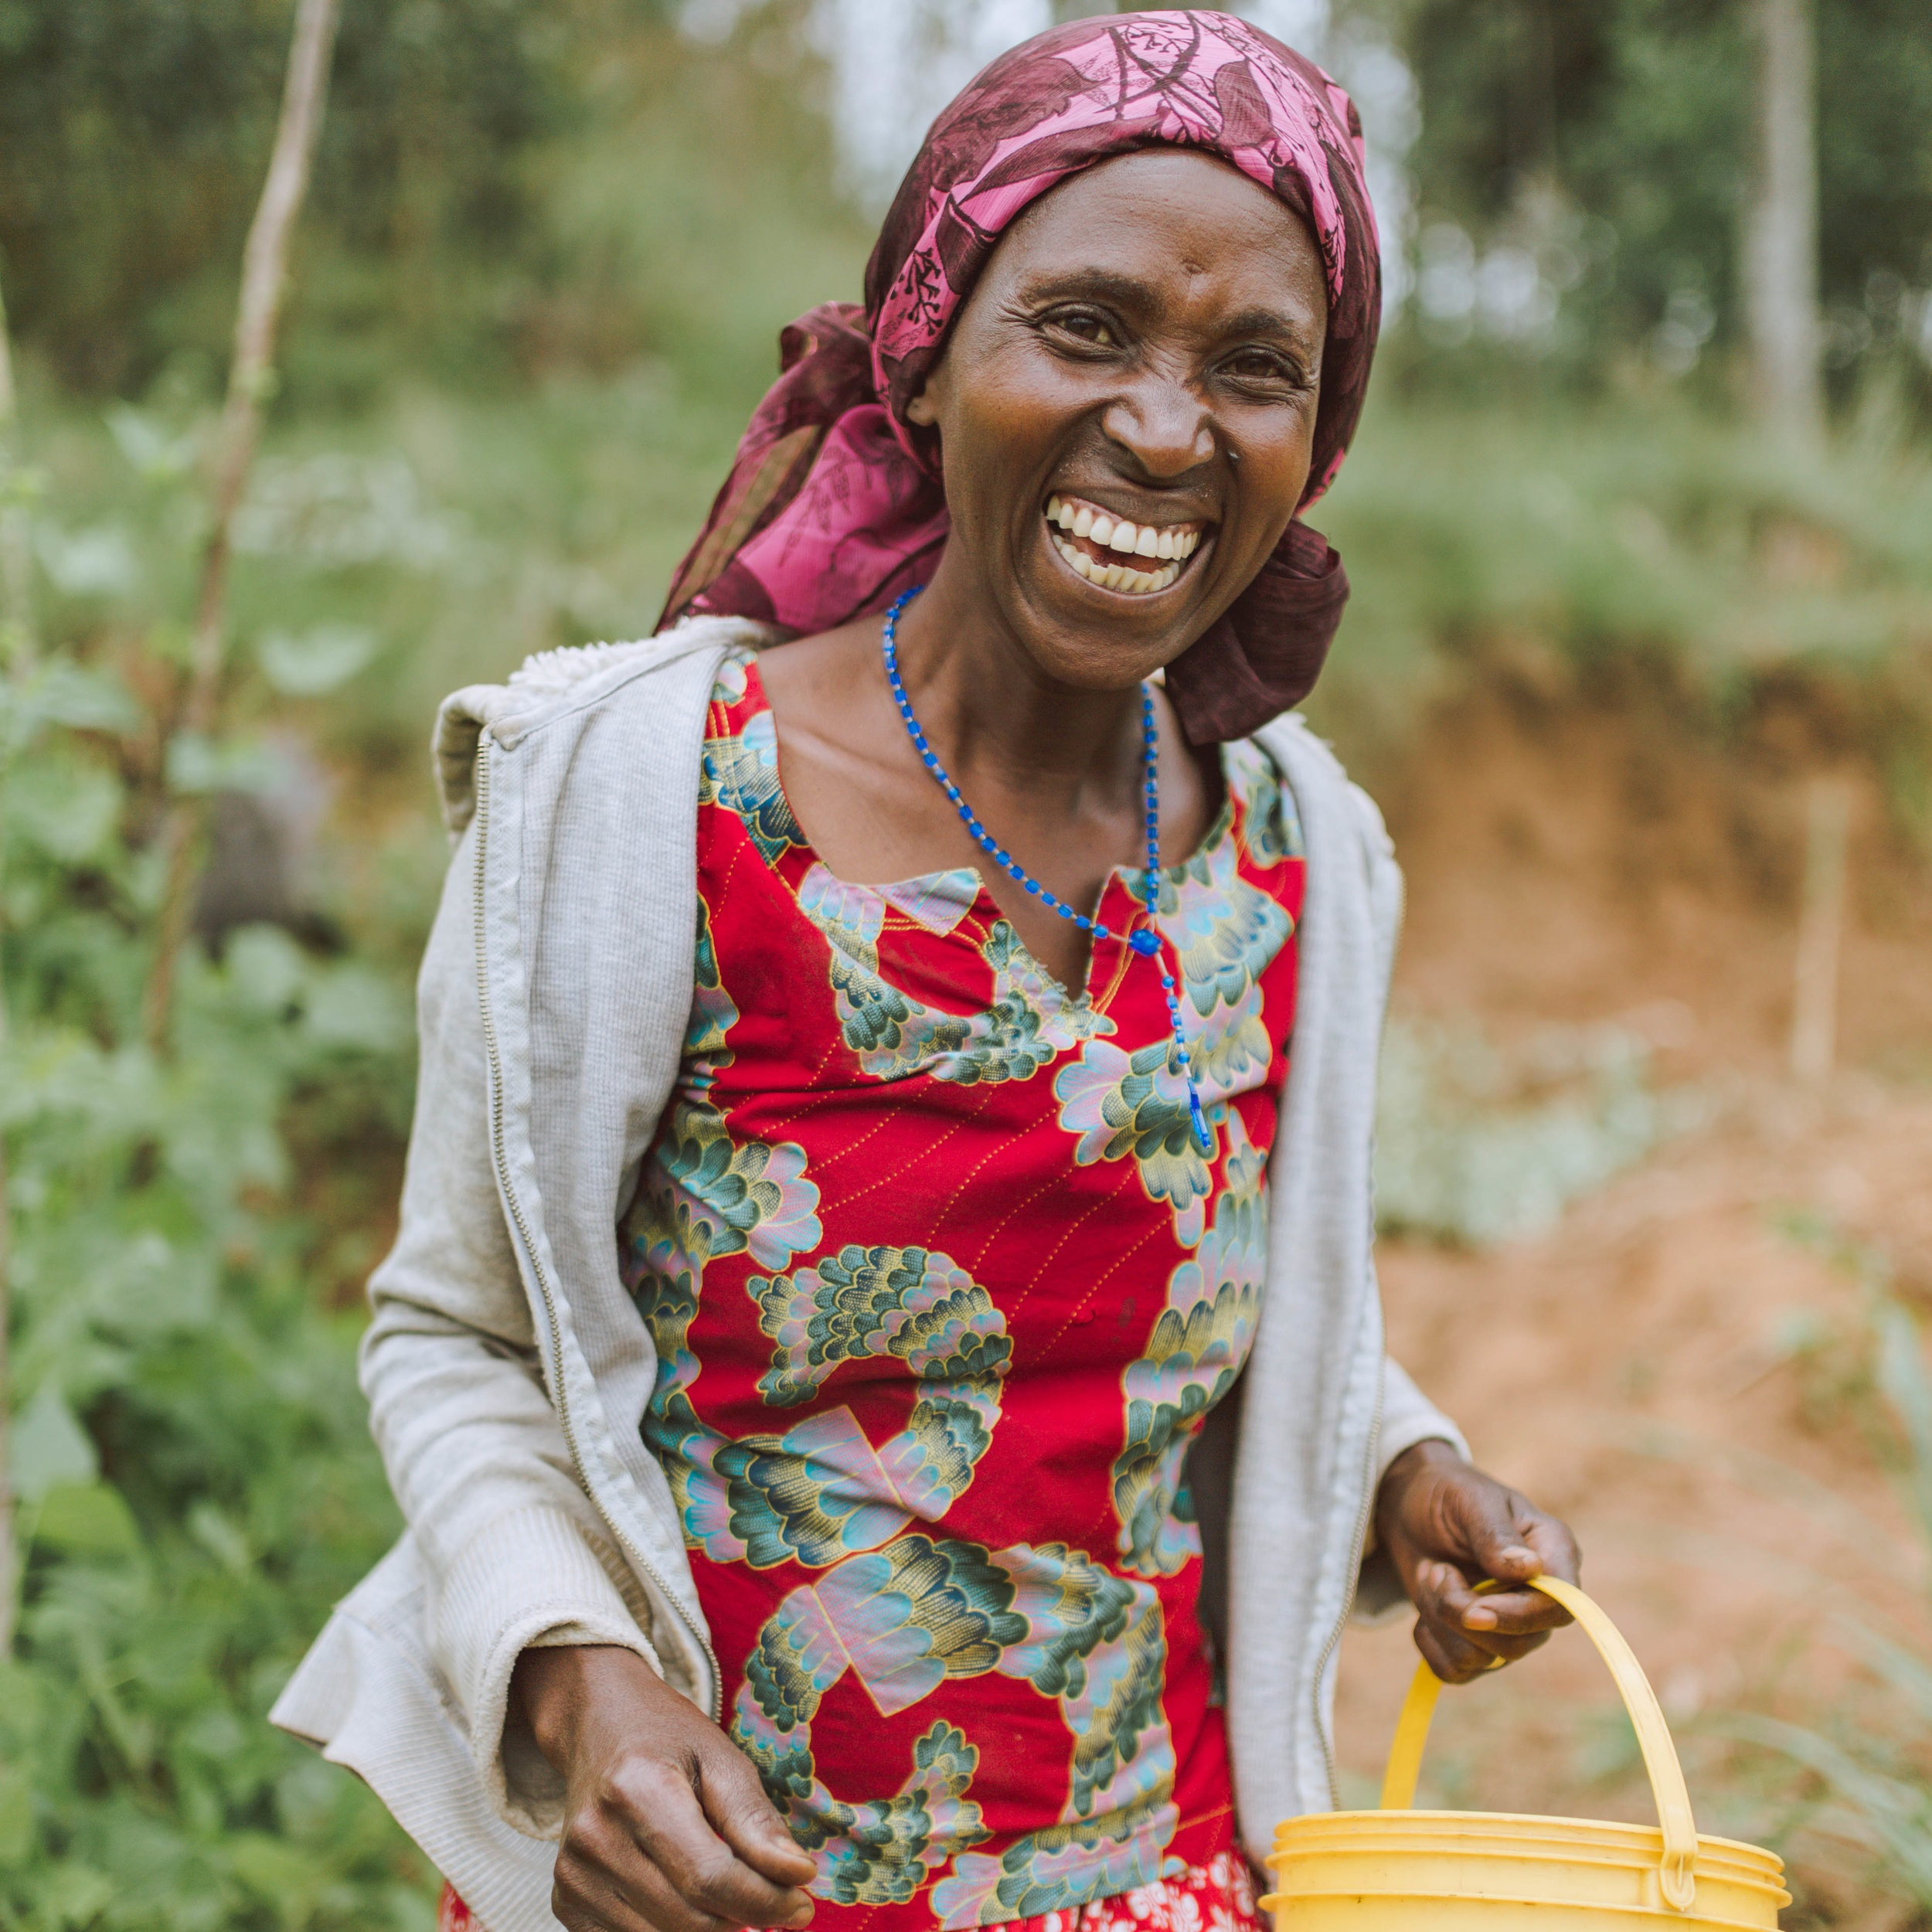 Eradicating Poverty Through Business Global Good